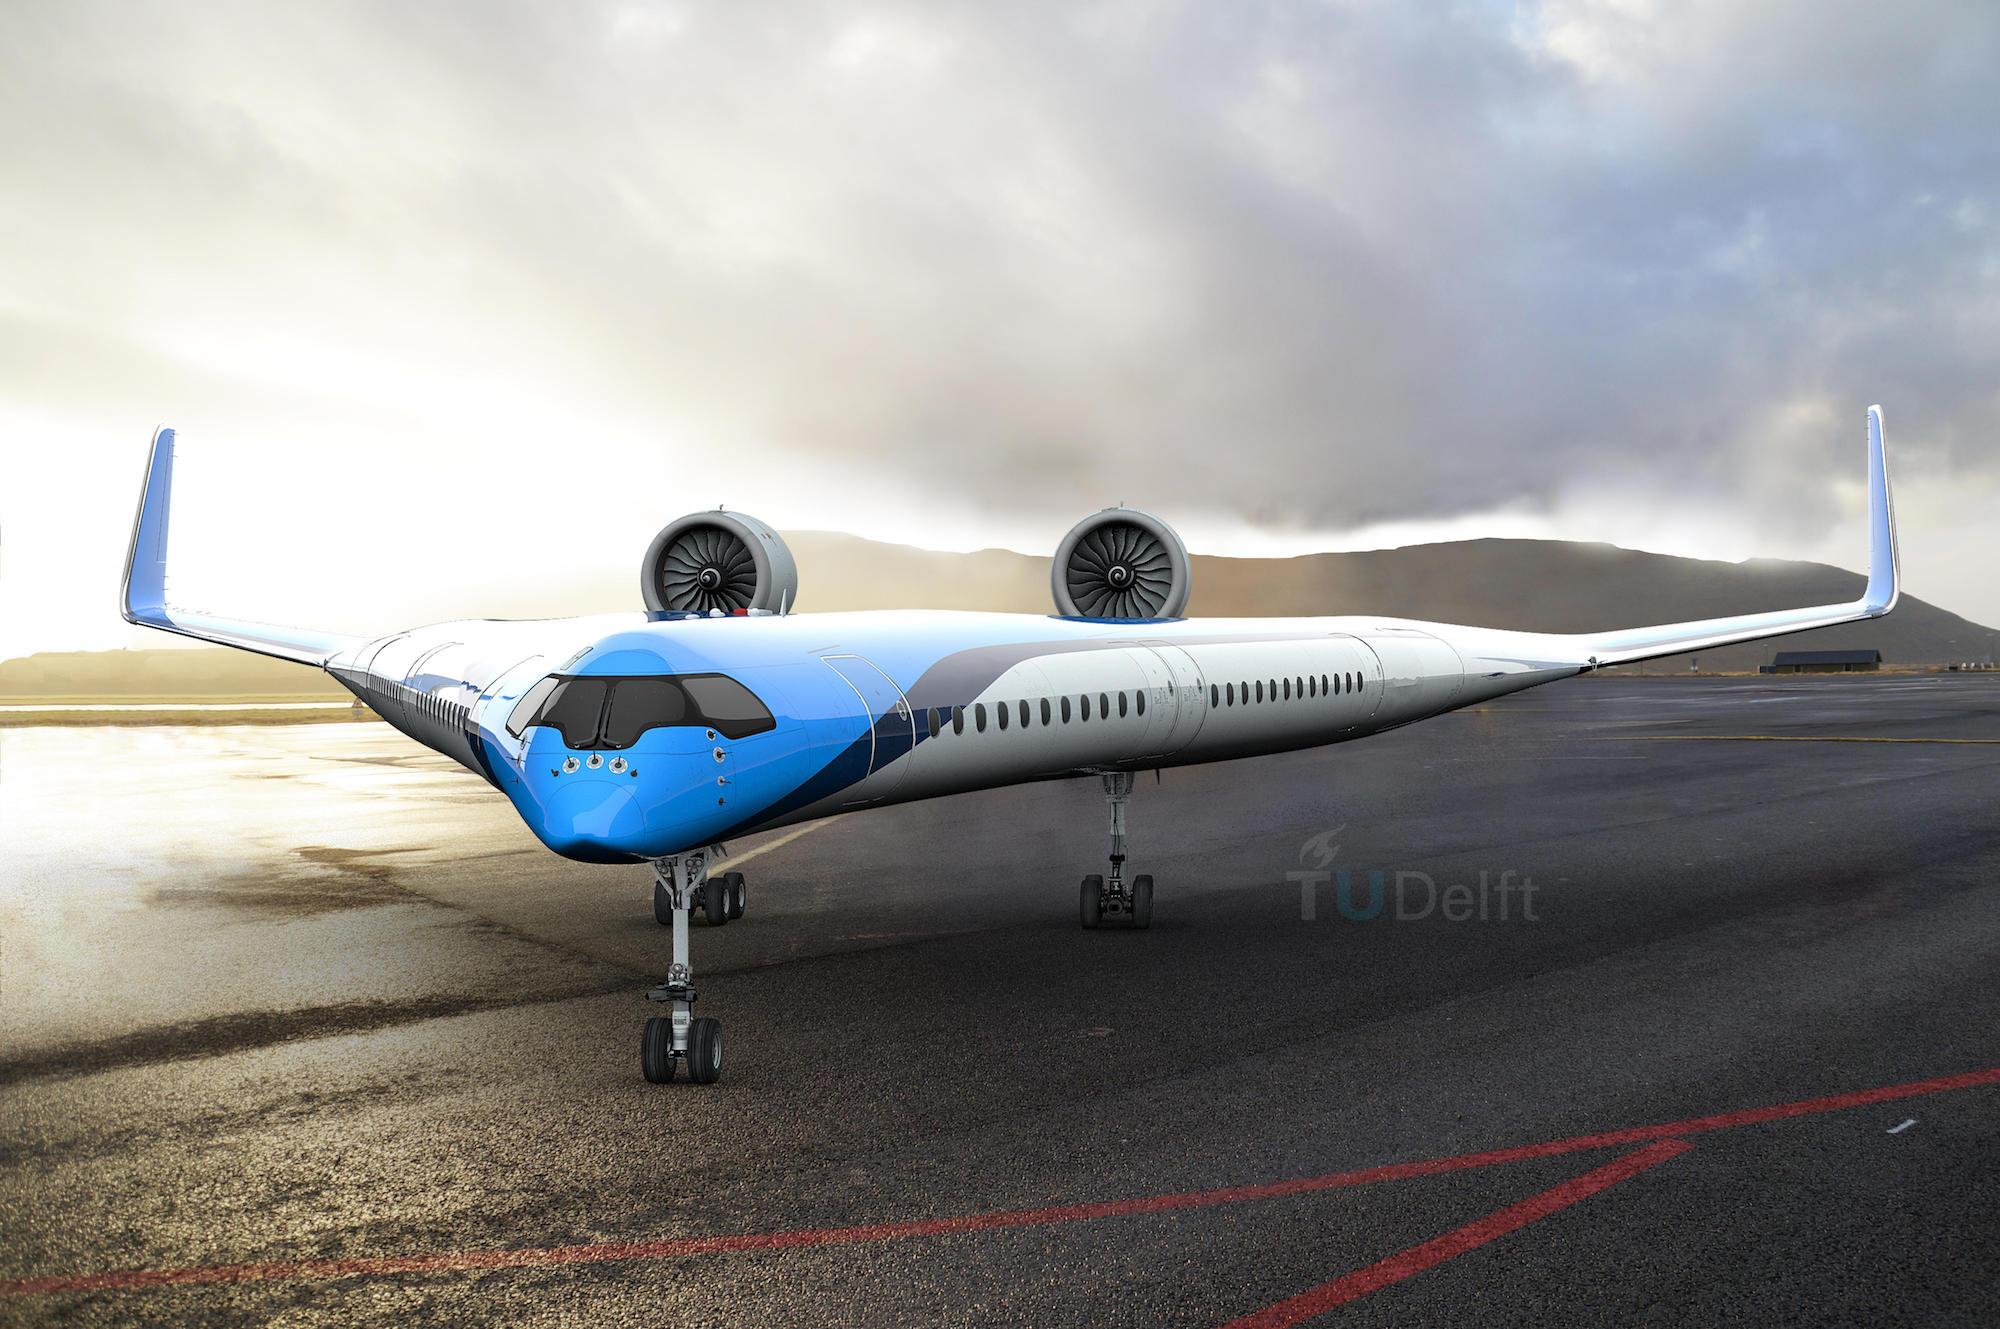 L'avion du futur, le Flying V